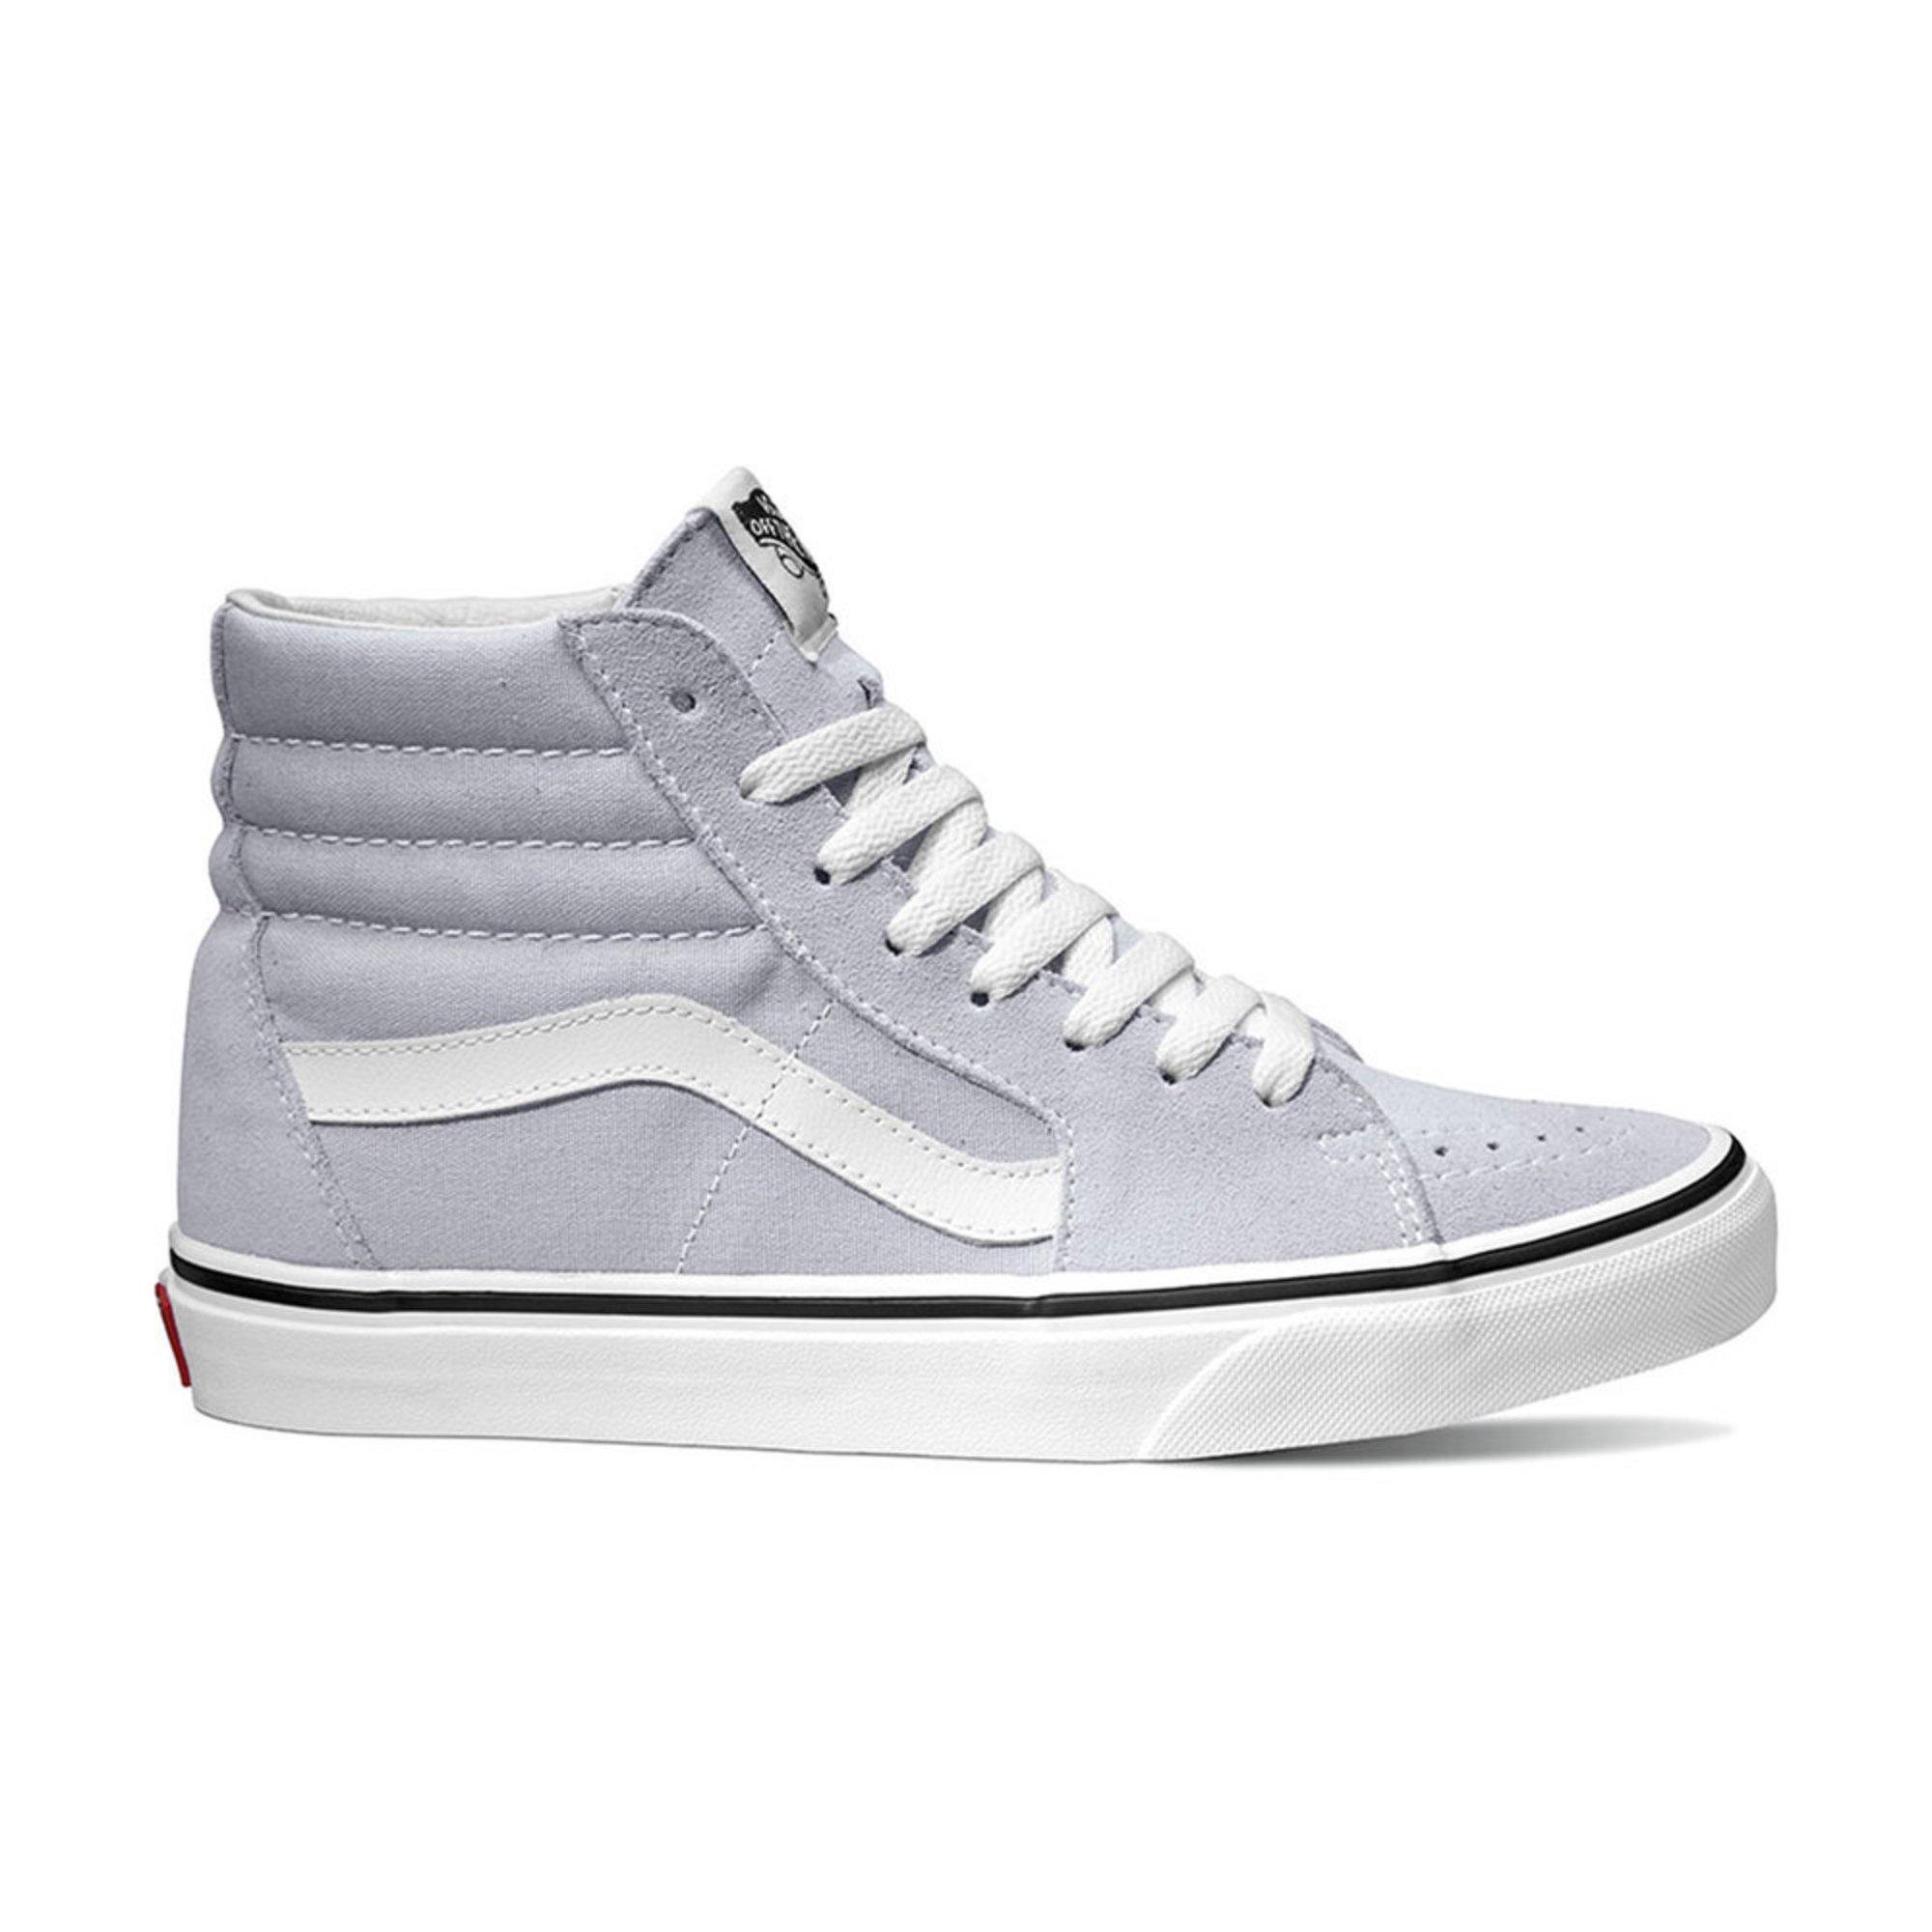 4ac04416f499 Vans Unisex Sk8-hi Skate Shoe